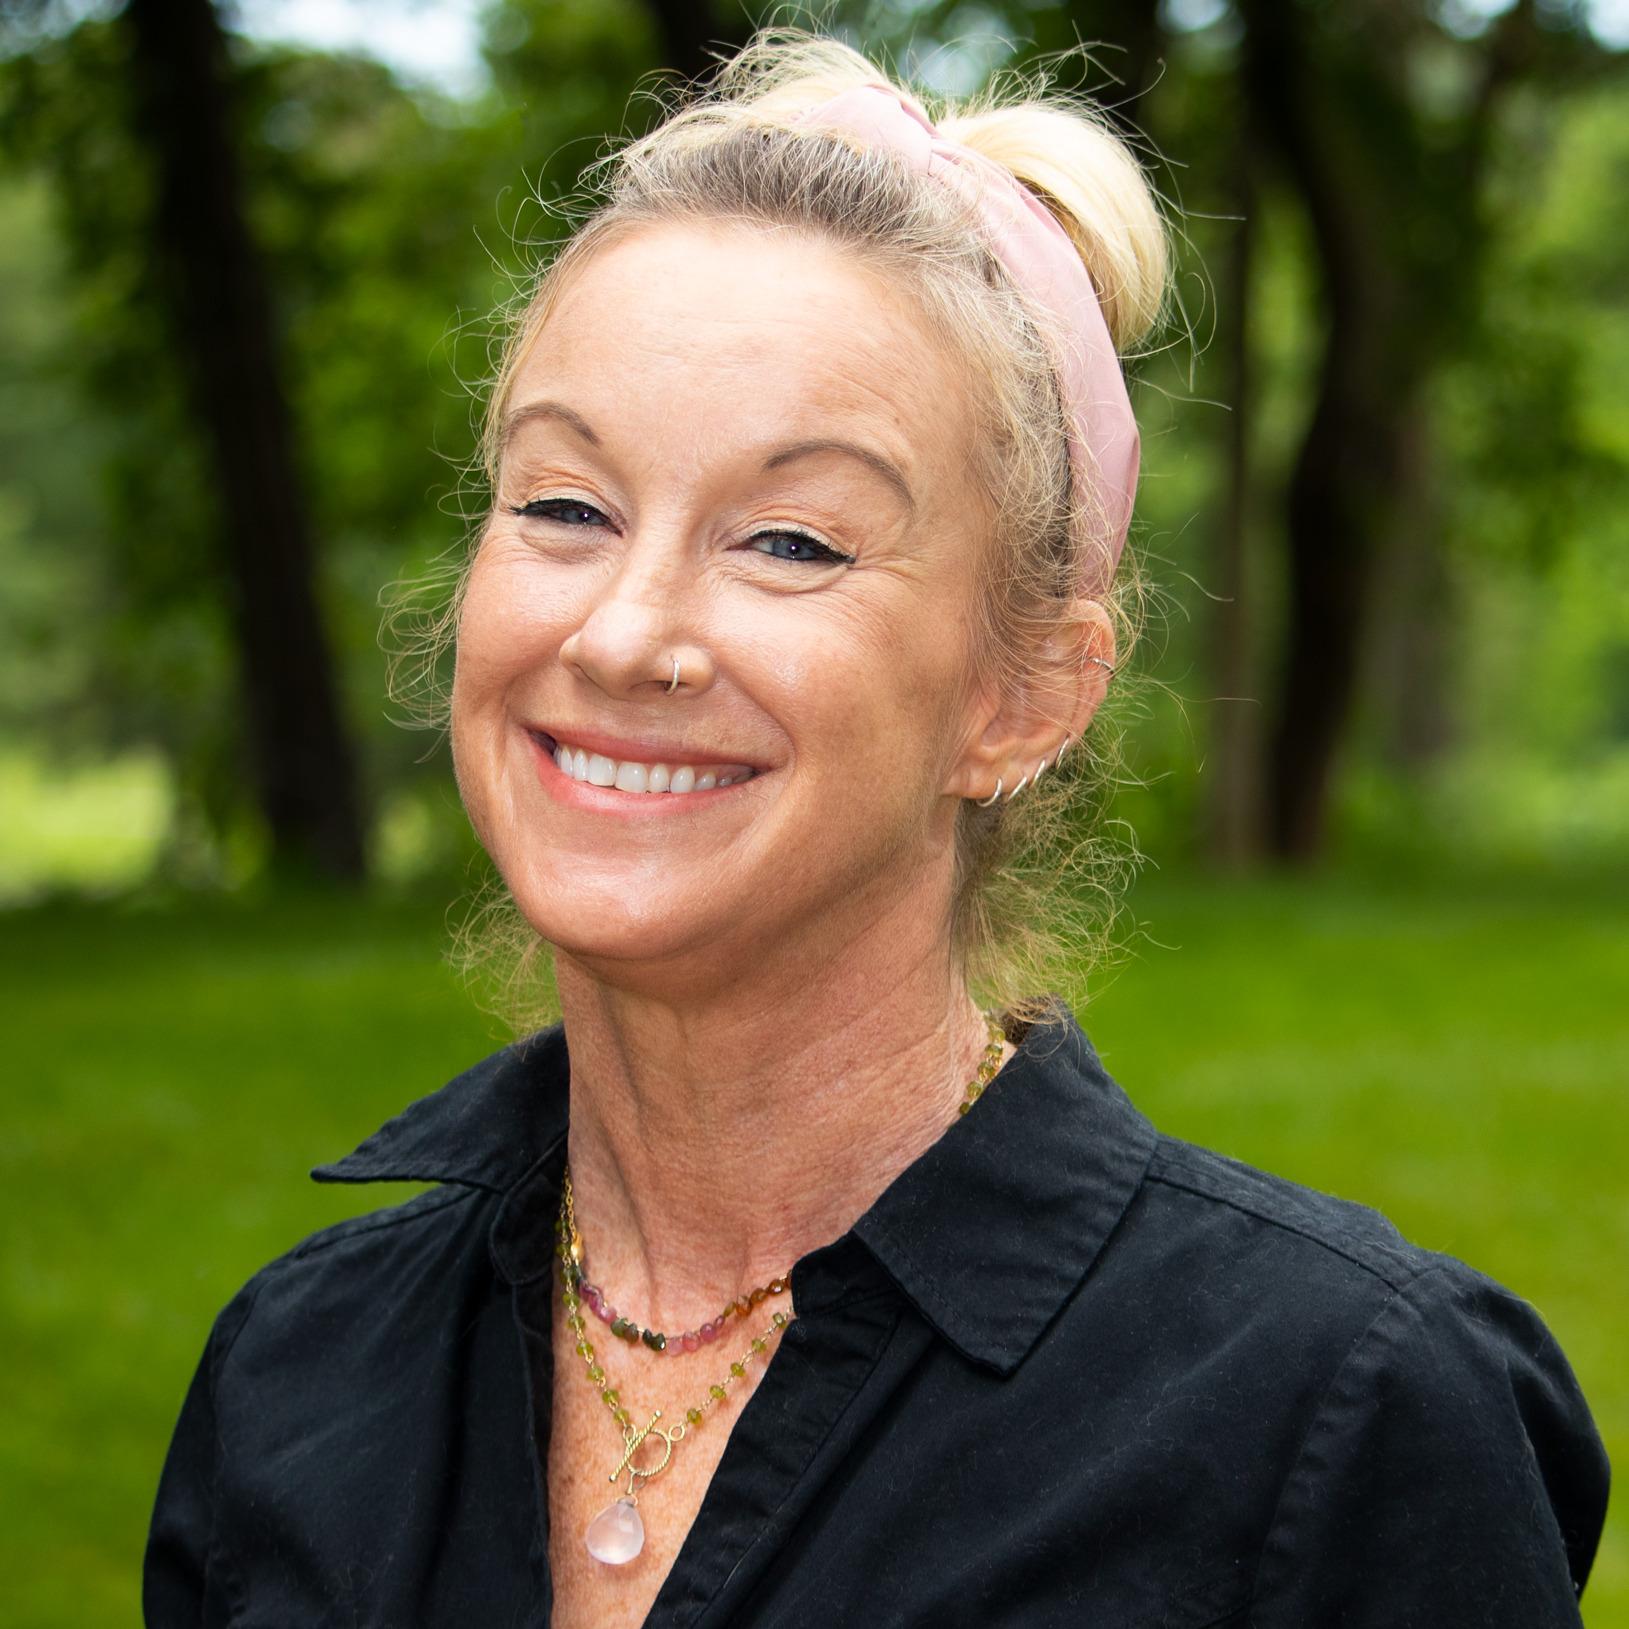 Profile photo of Elle Roth